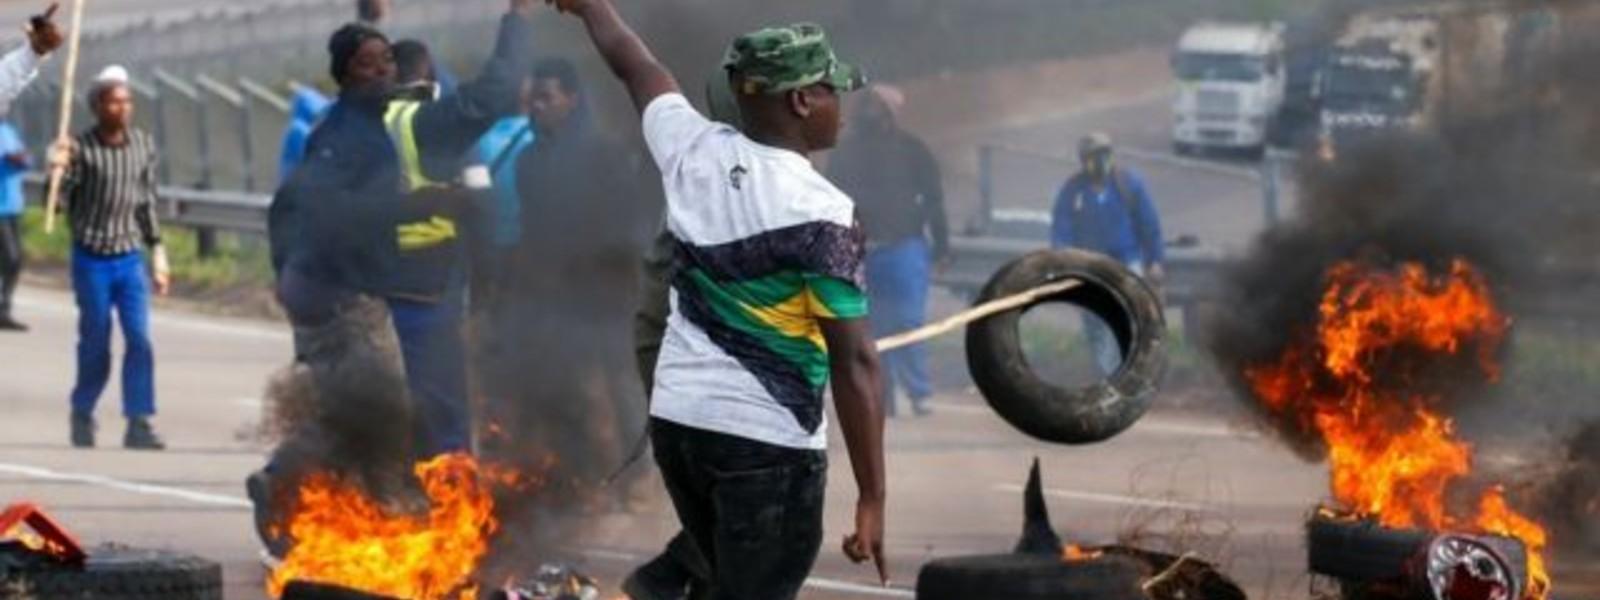 Death toll climbs as South Africa violence spirals